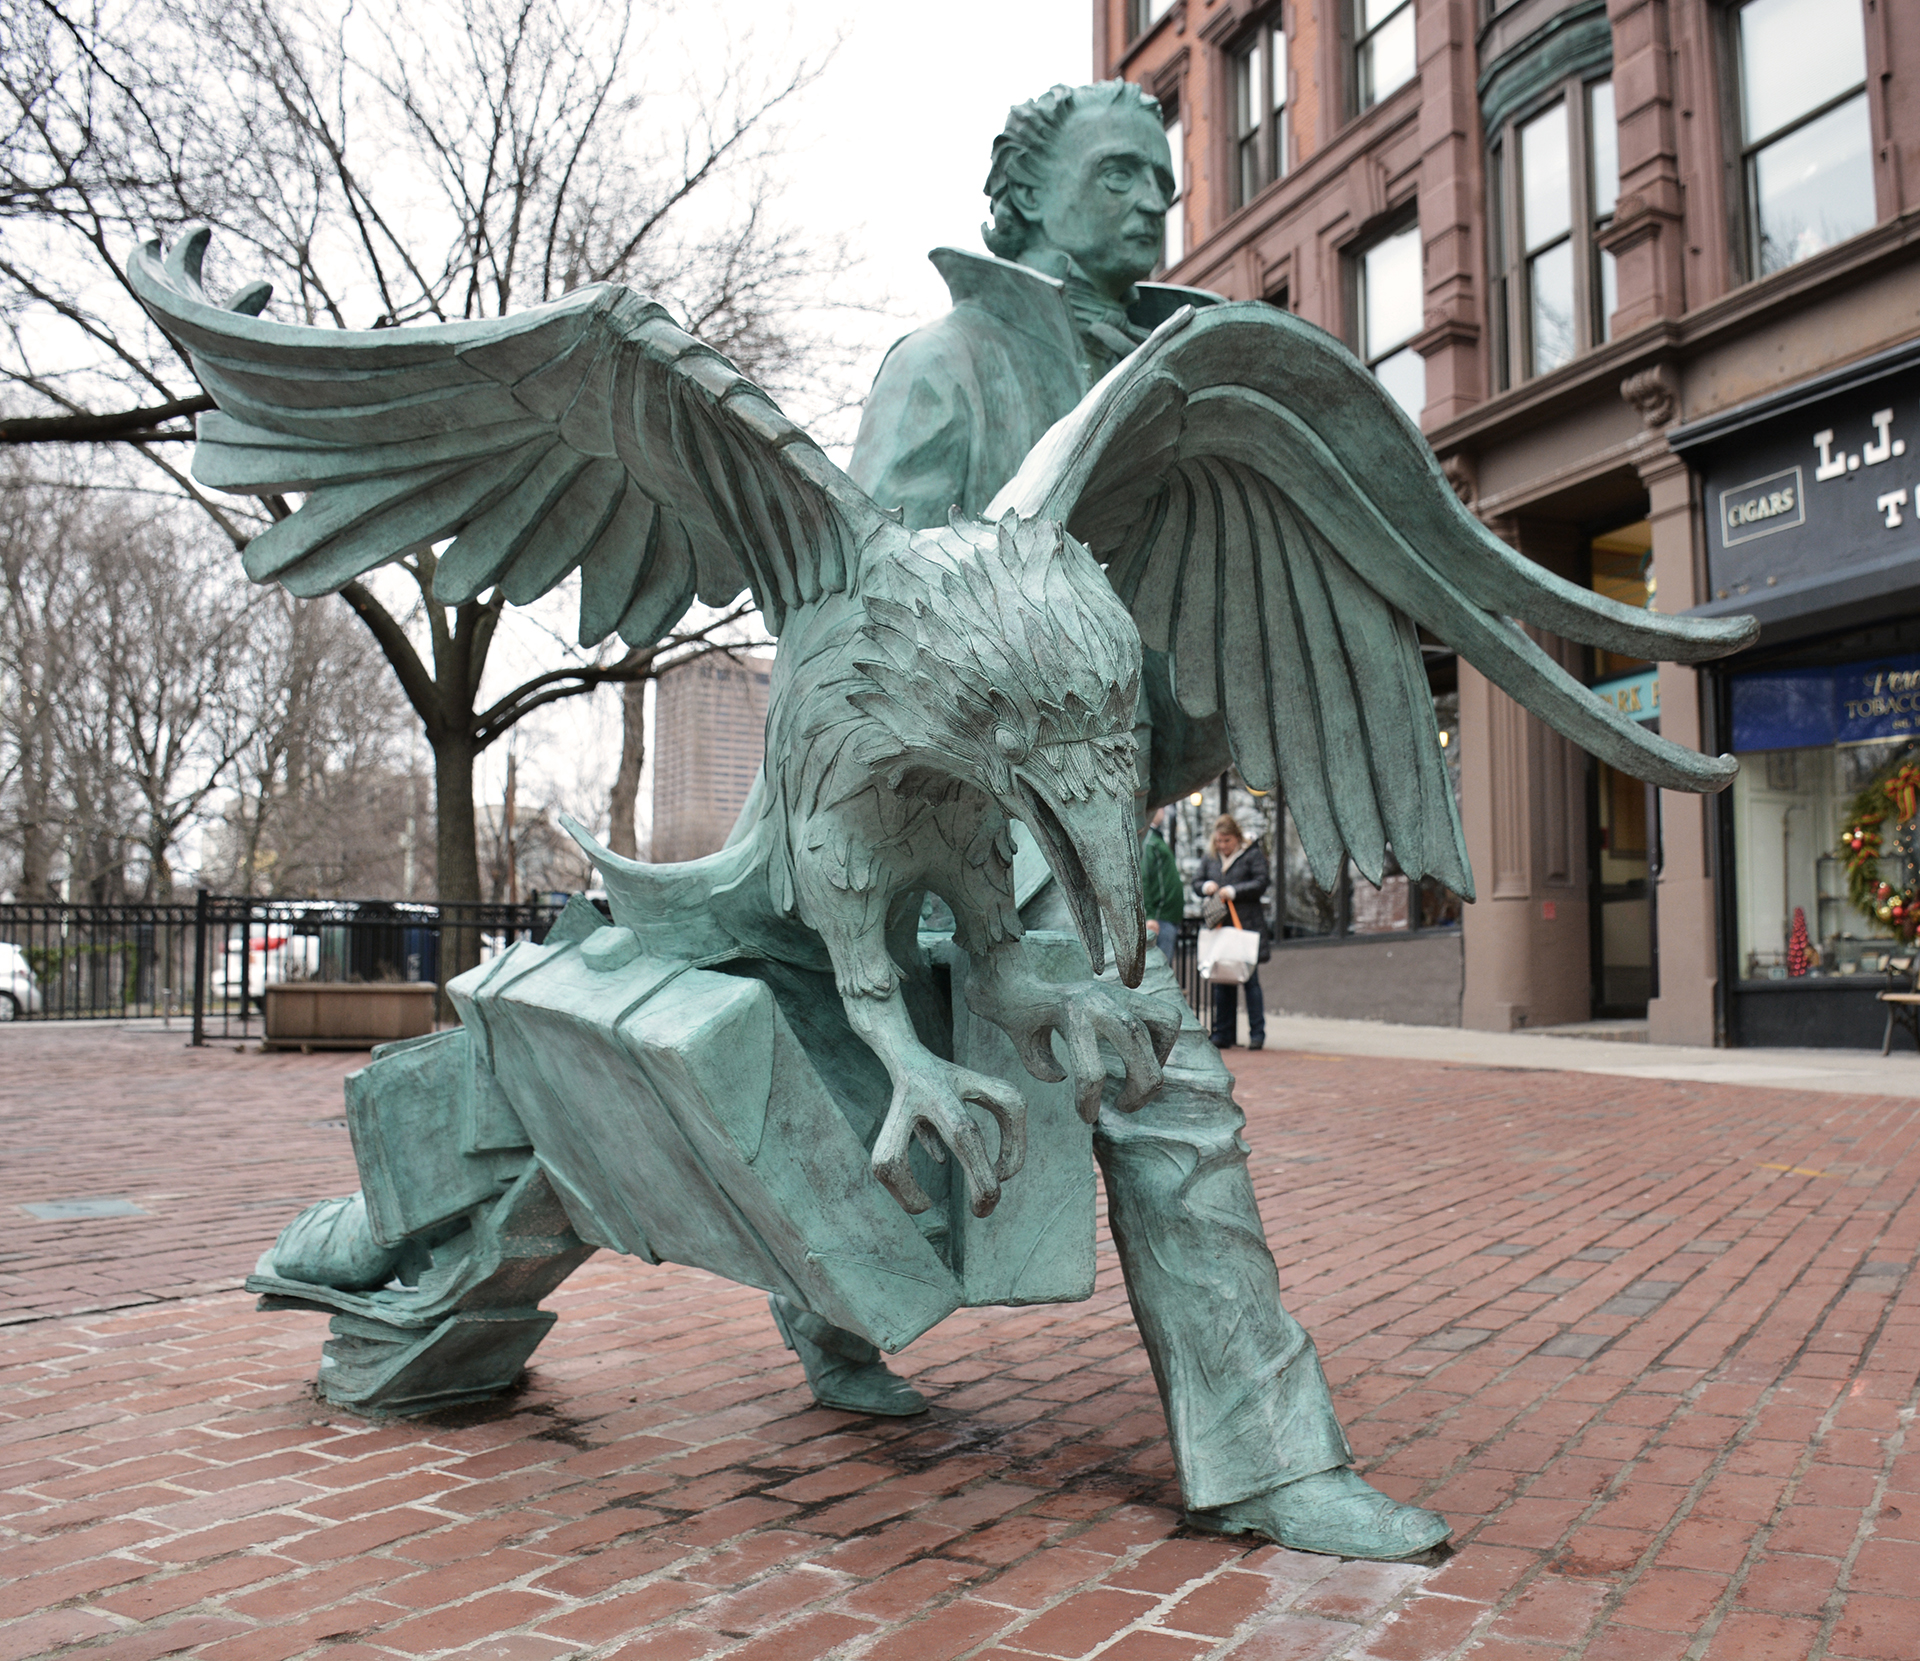 Poe Returning to Boston